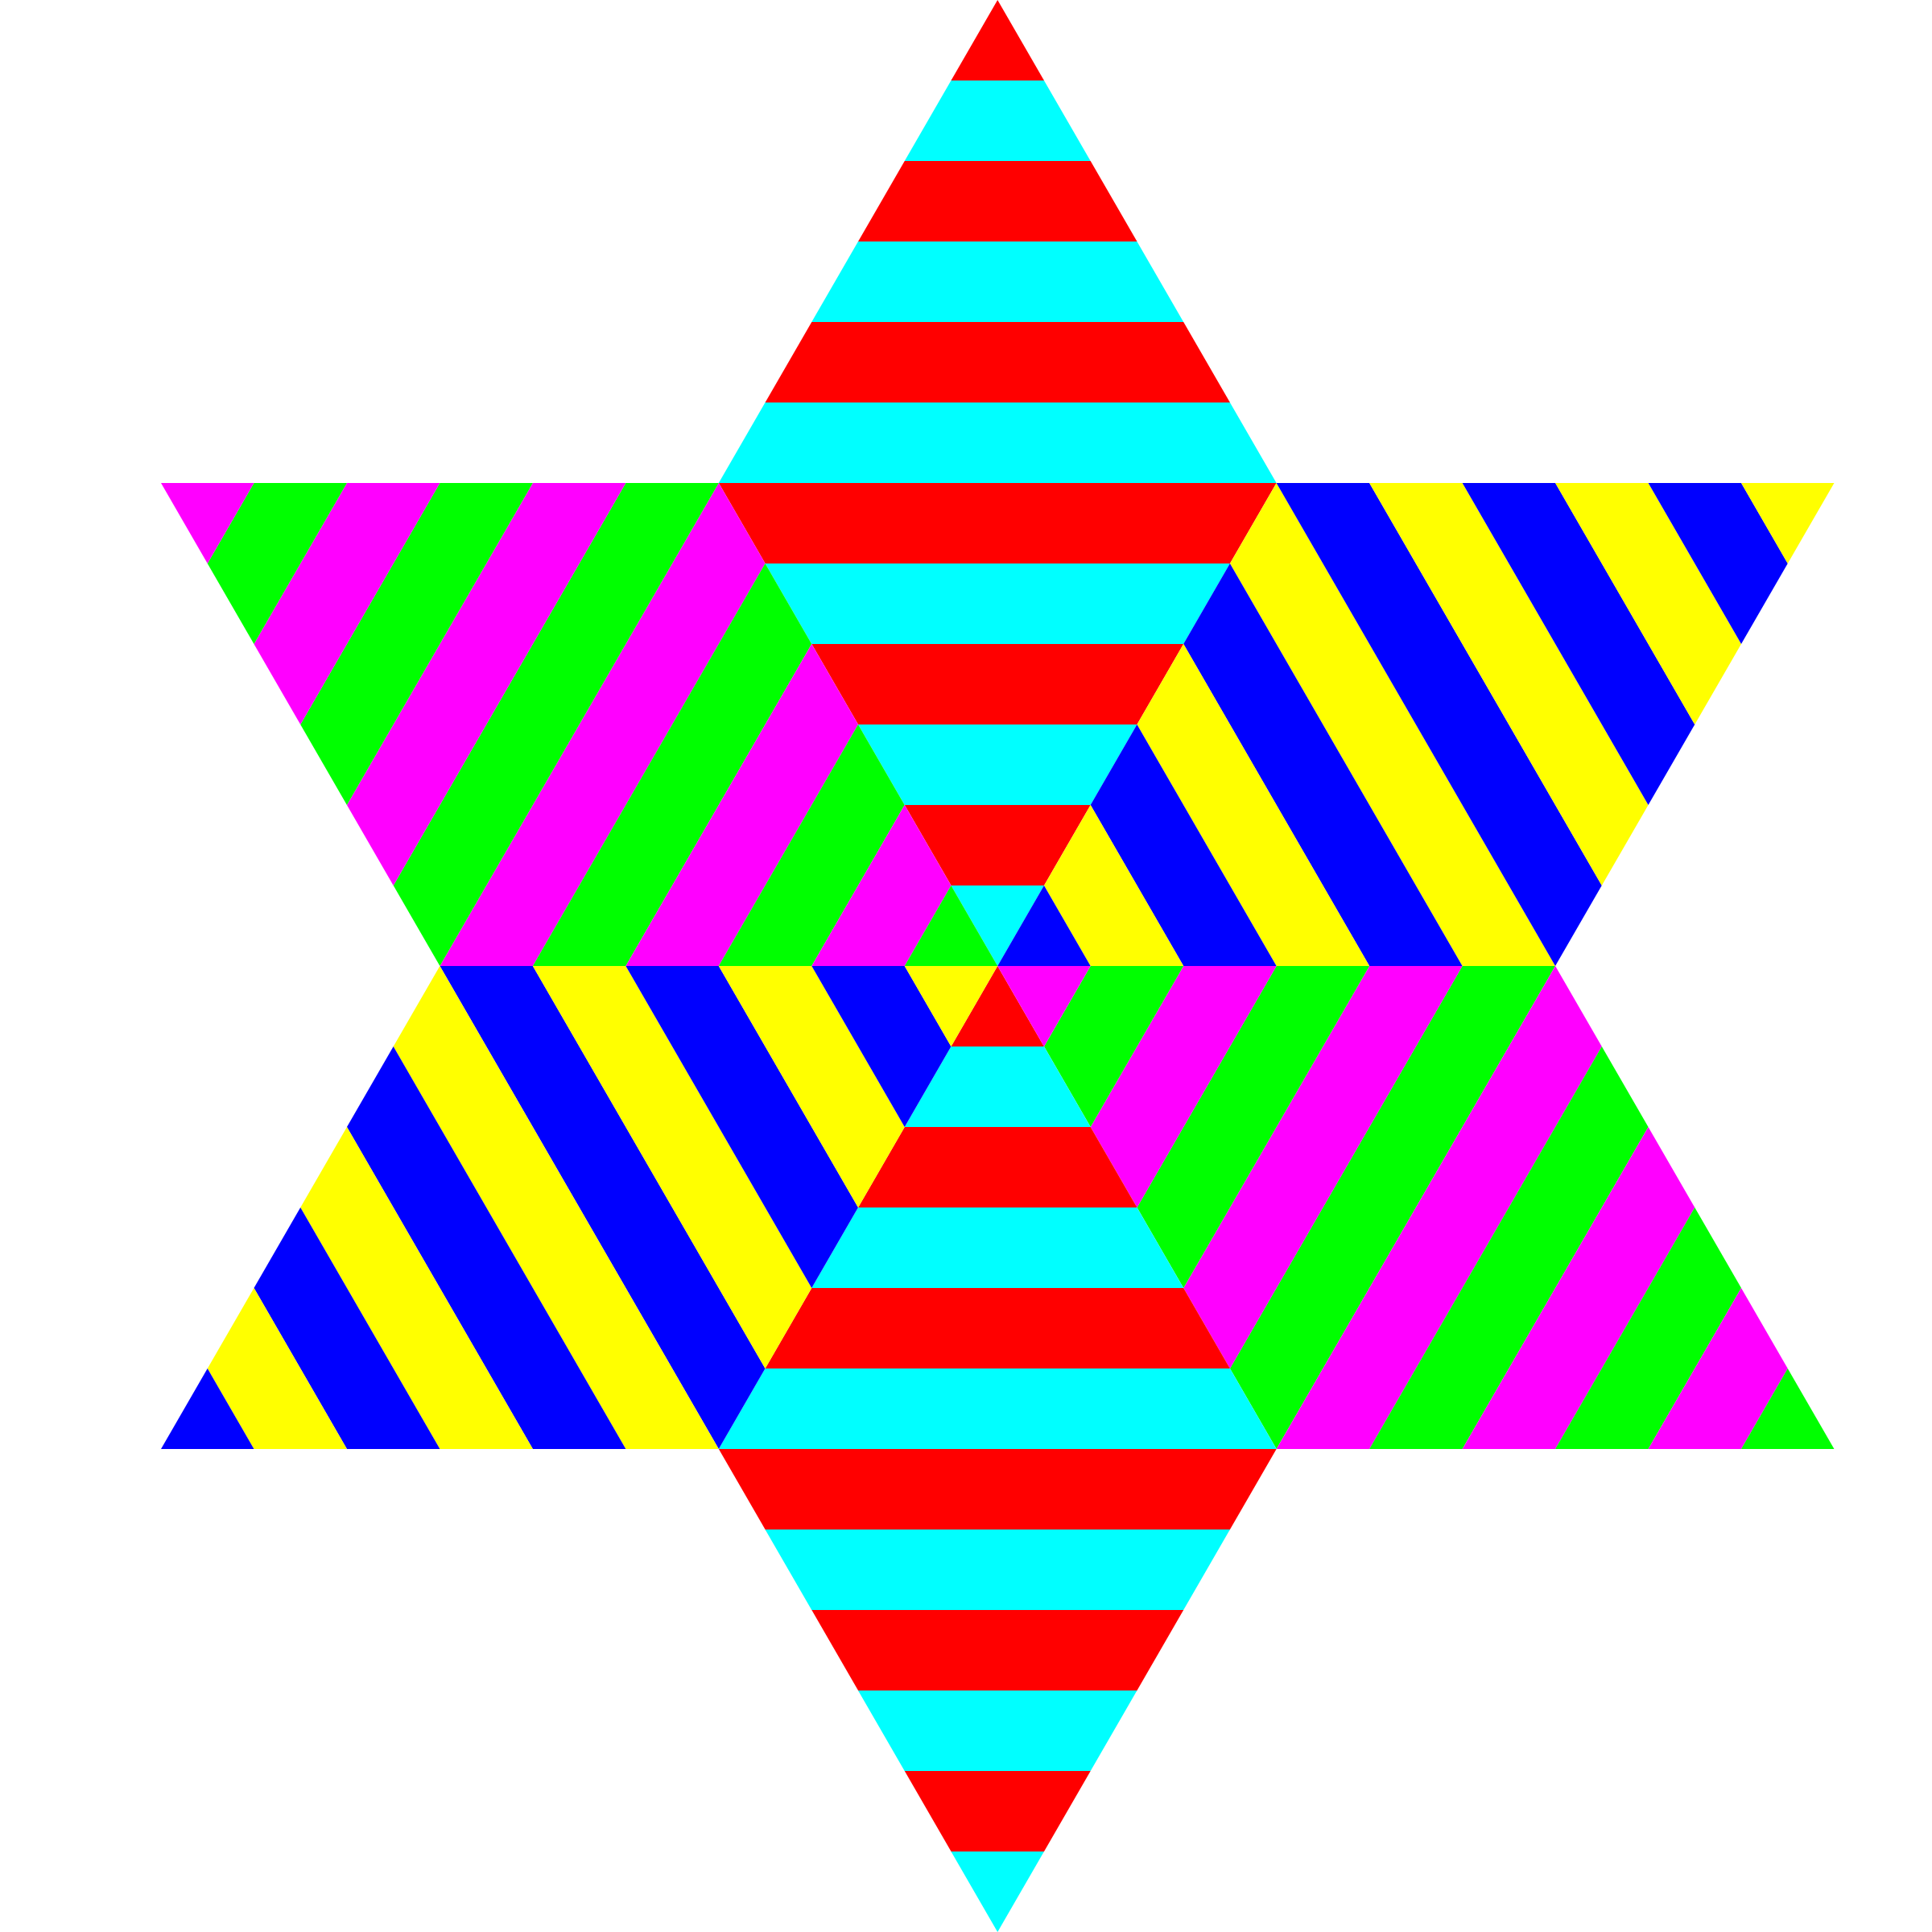 Diamond clipart coloured. Hexagram triangle stripes big